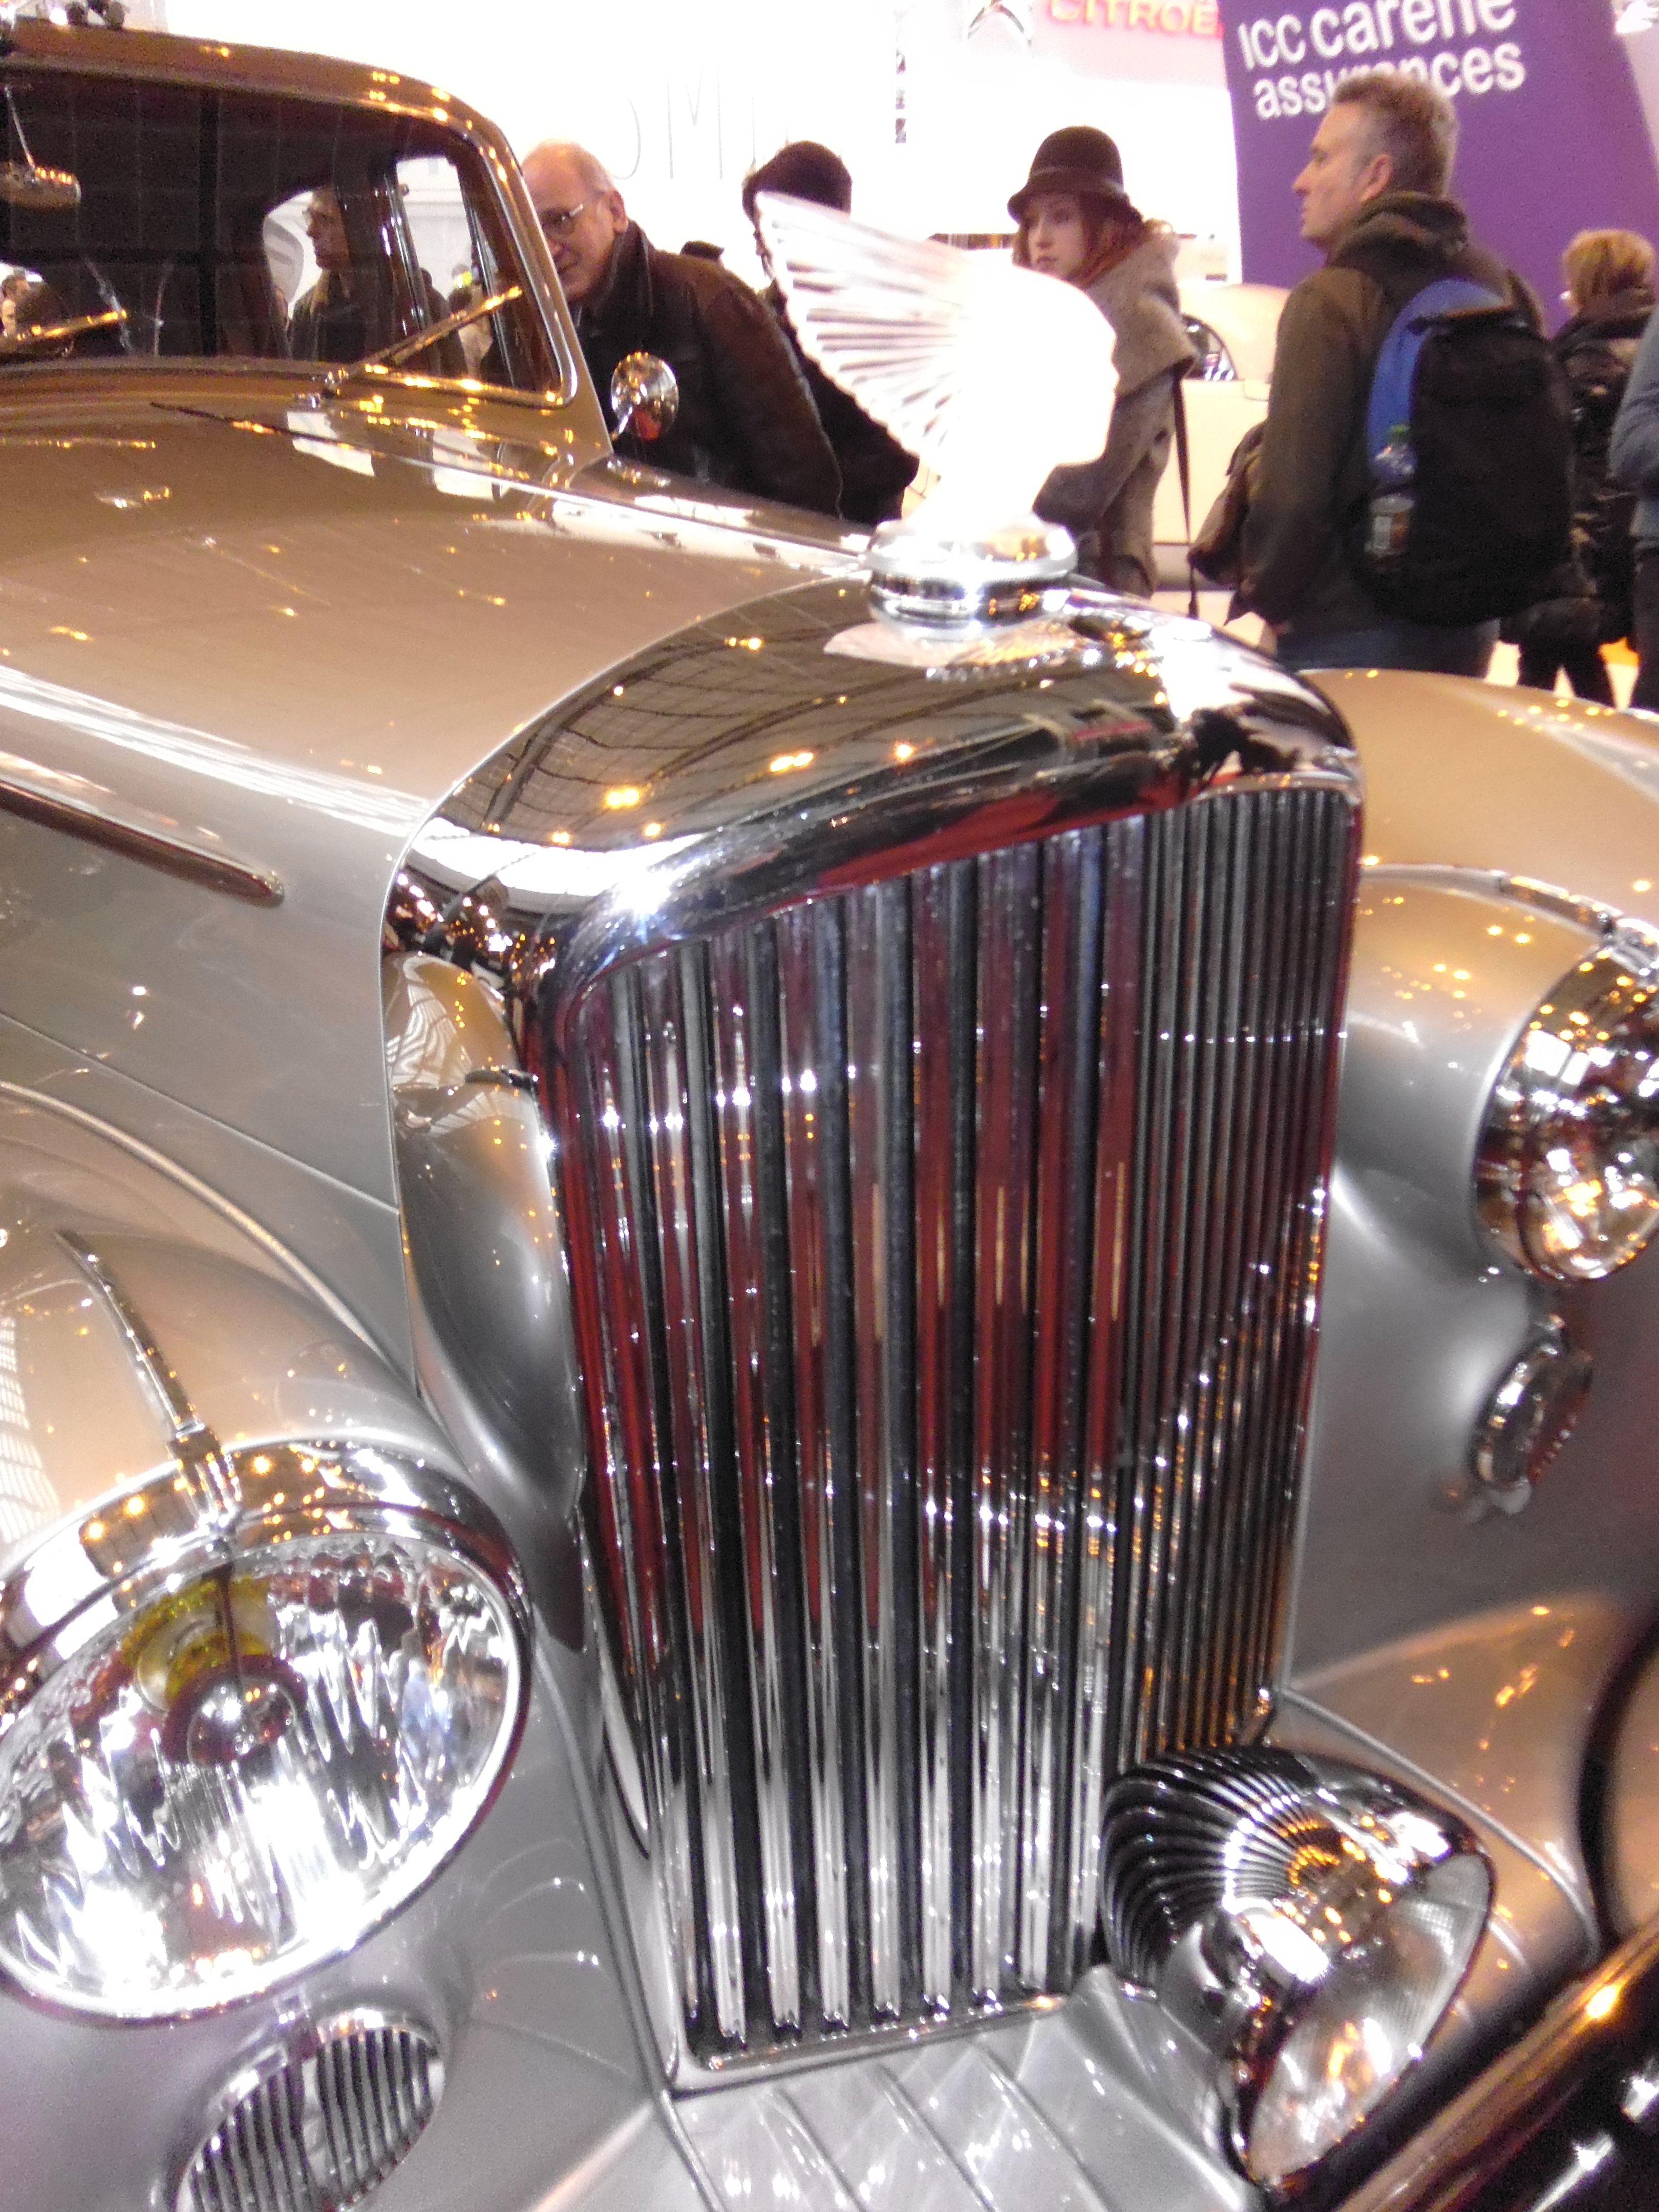 Lalique 'Victoire' on a superb 1950's Bentley.